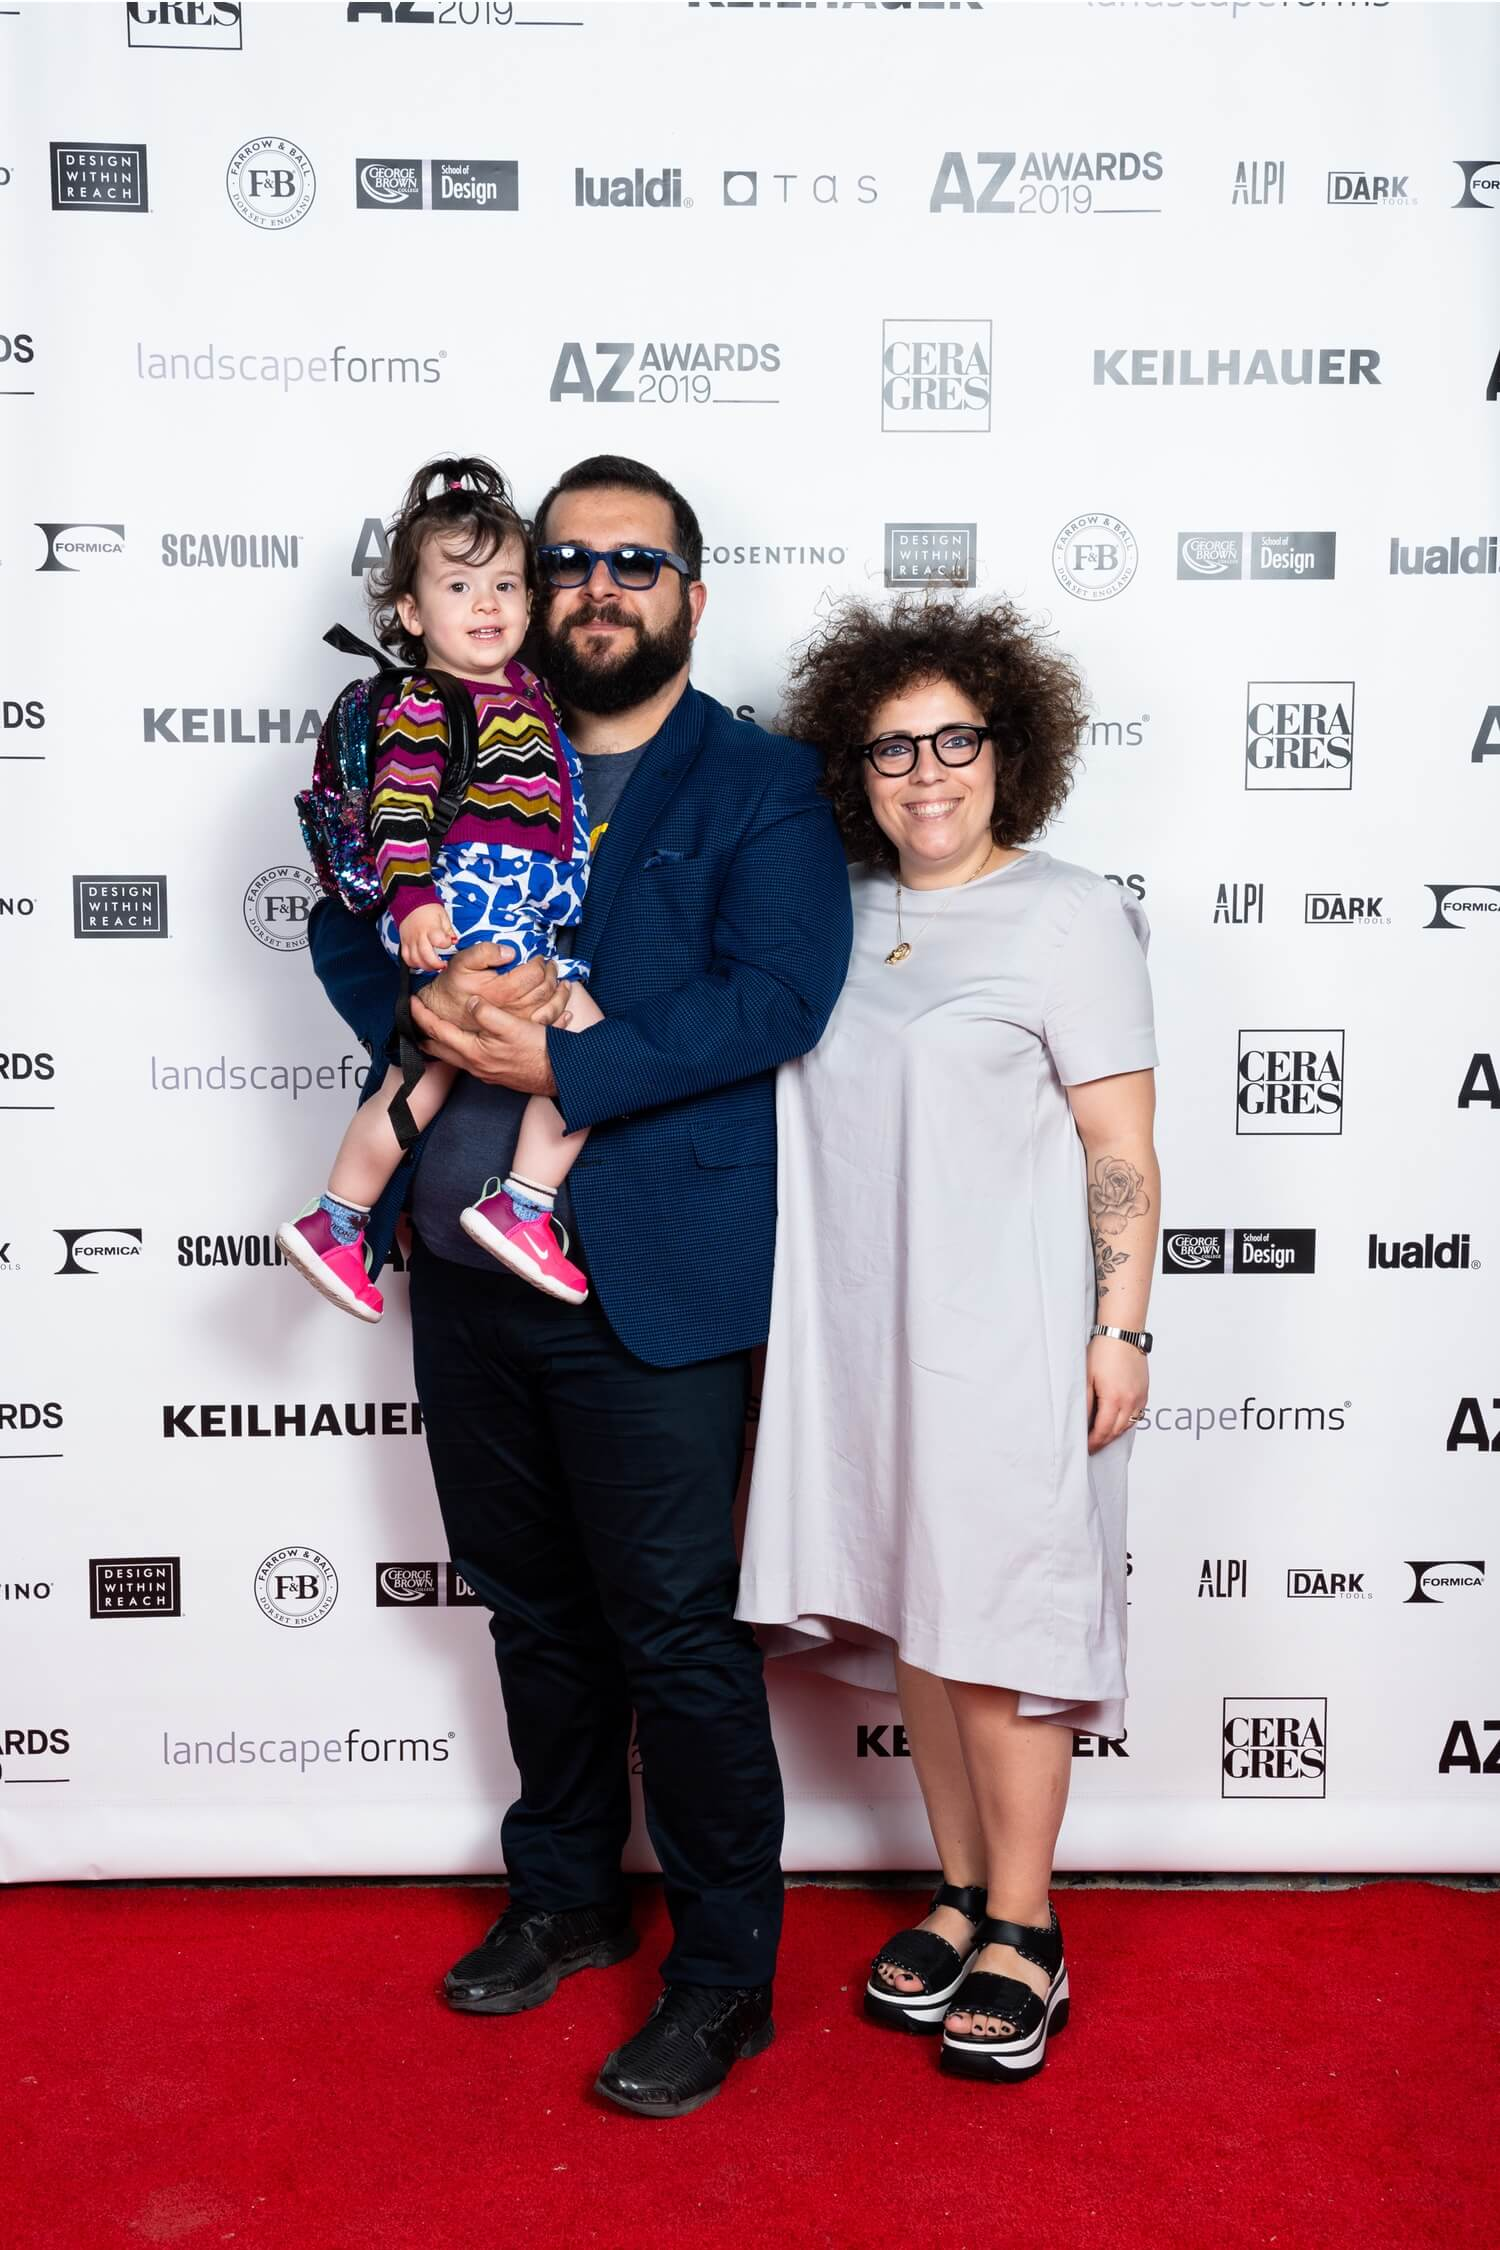 Designers Juri Iaboni and Nanelda Priftaj with their daughter, AZ Awards 2019: Scenes from the Gala